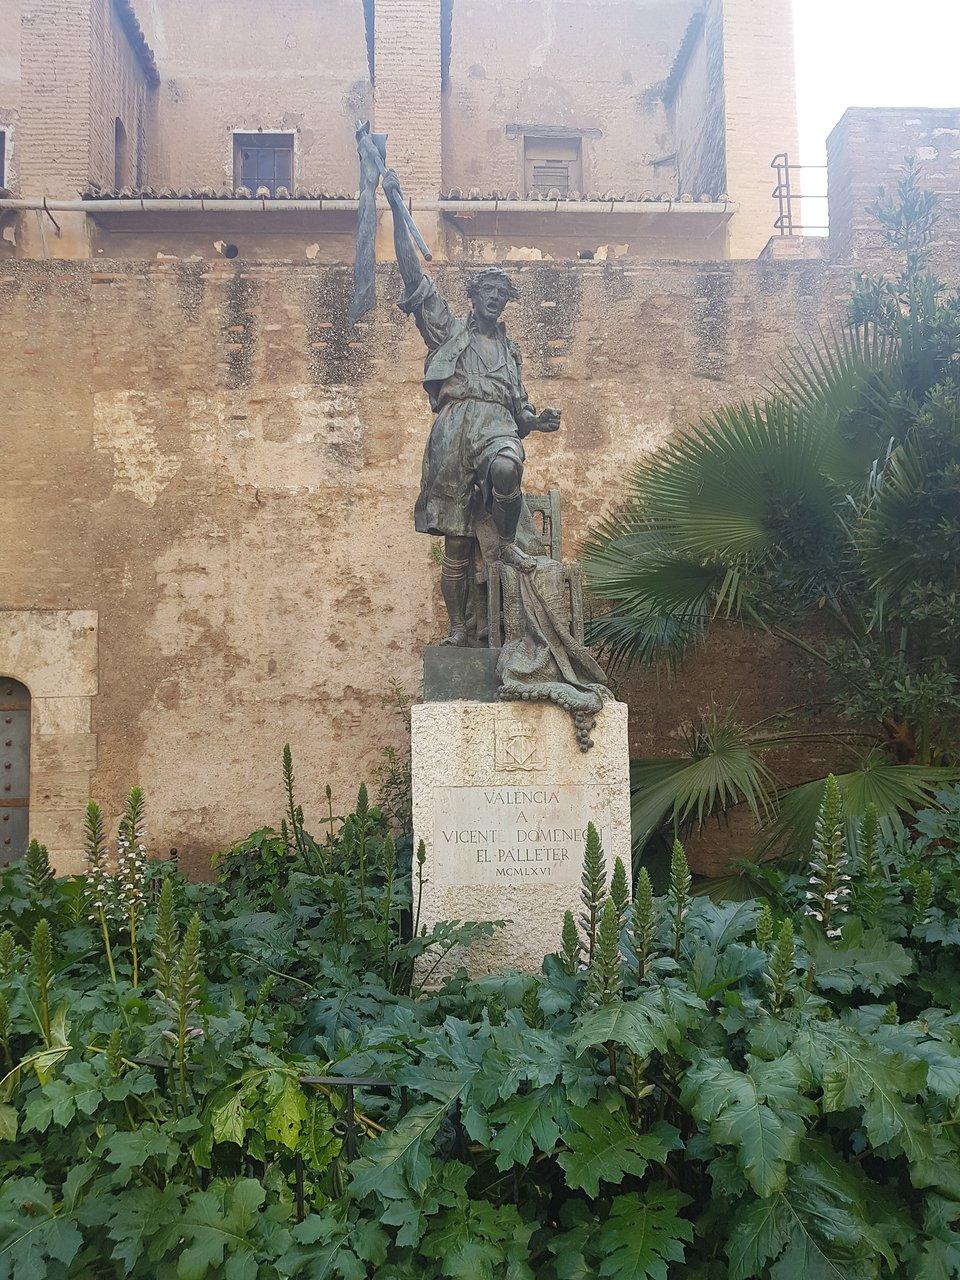 Monumento A Vicente Domenech Valencia 2020 All You Need To Know Before You Go With Photos Tripadvisor